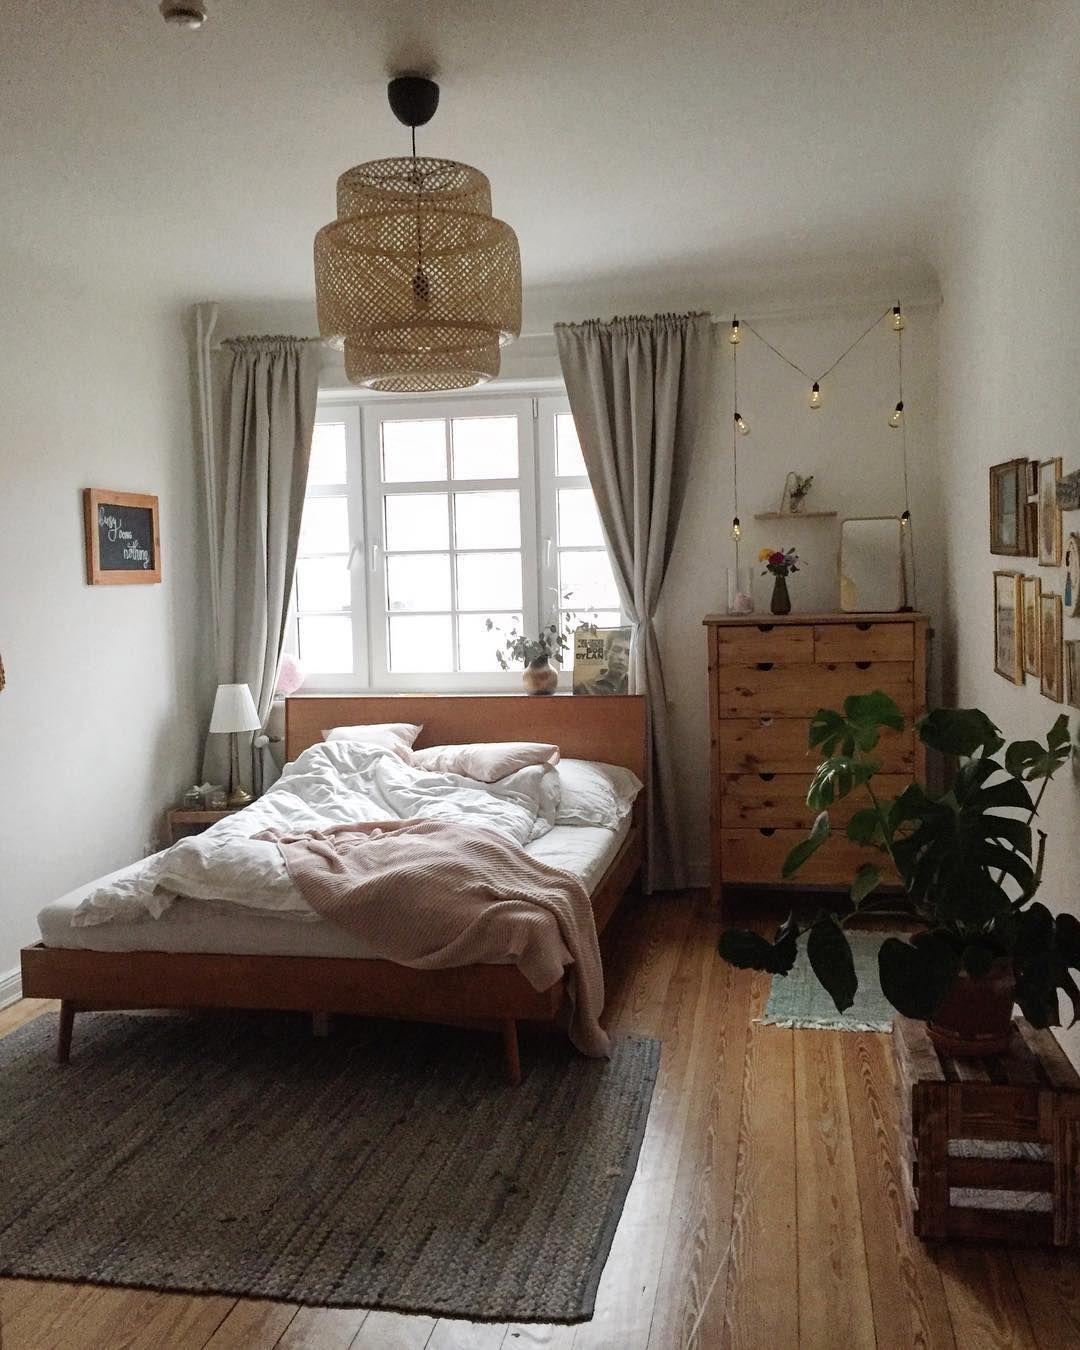 T I N N A On Instagram A New View Of The Bed And I Think